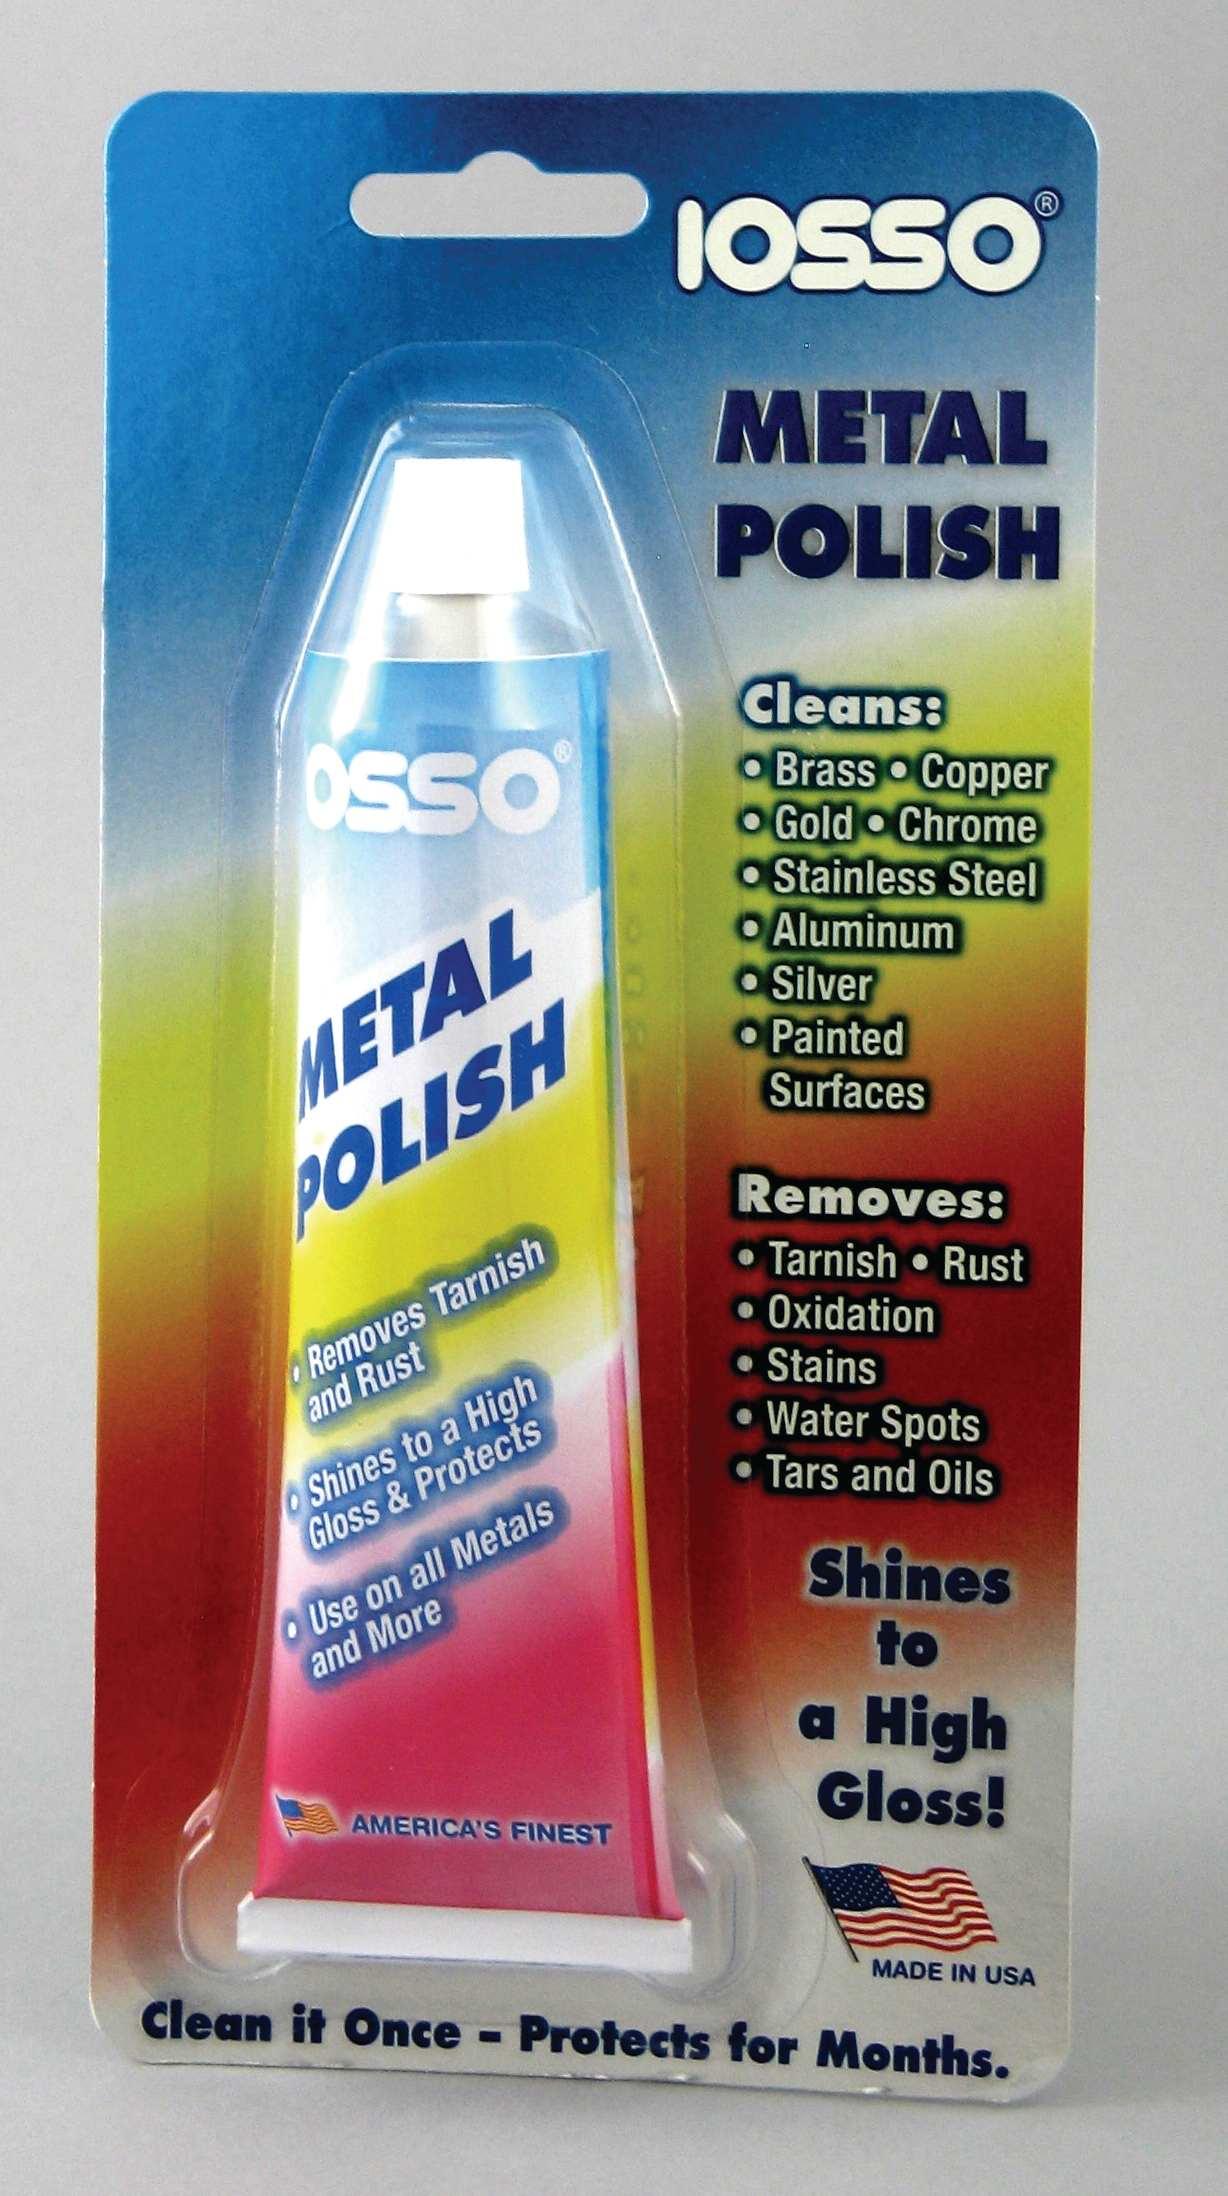 IOSSO Metal Polish (1 lb.)